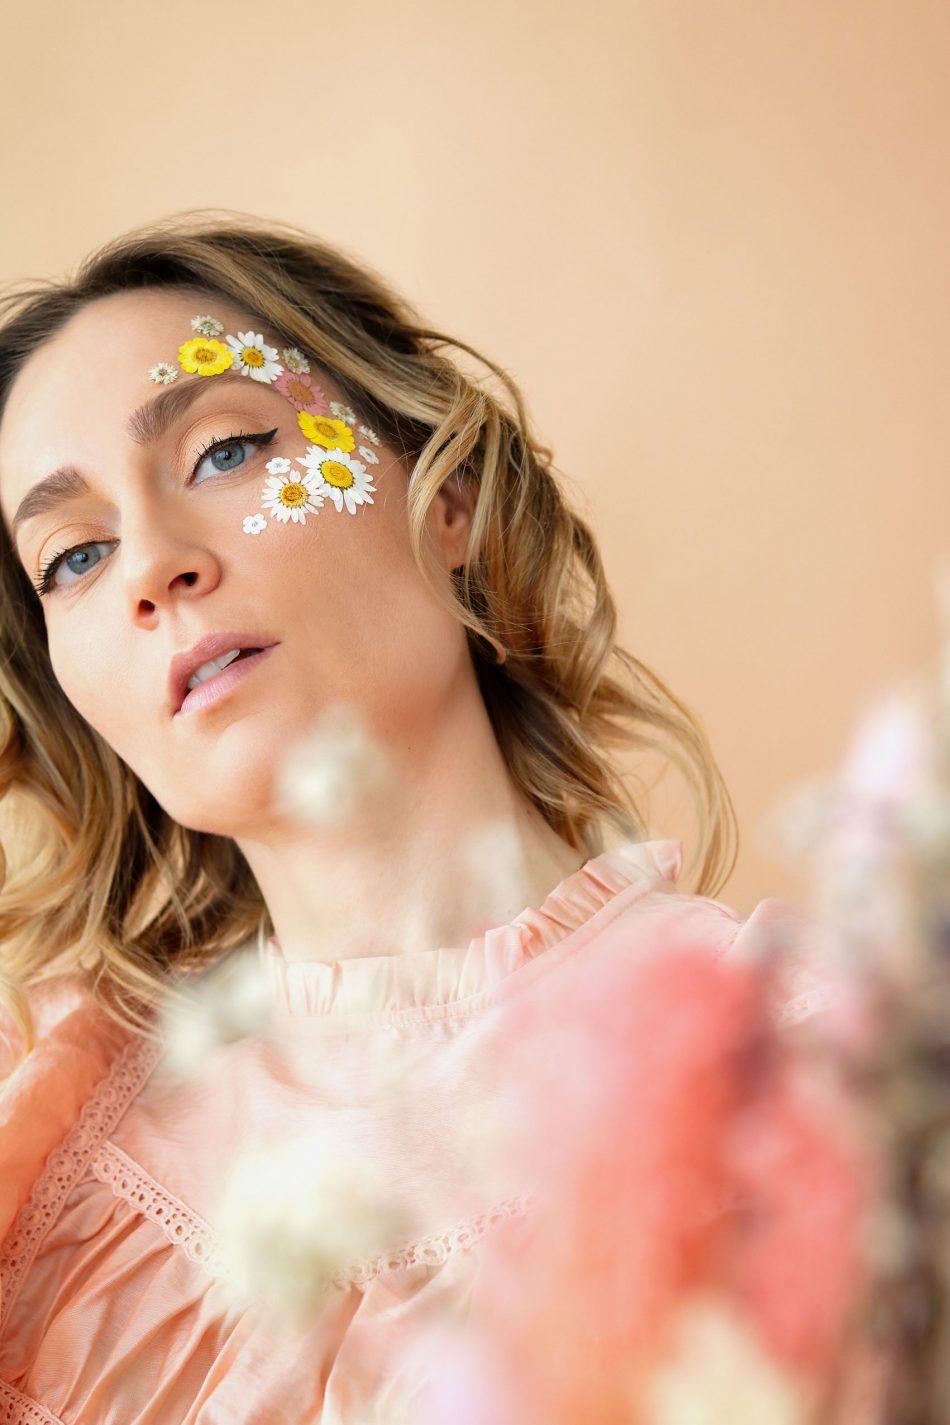 diy-flower-make-up-blog-artlex